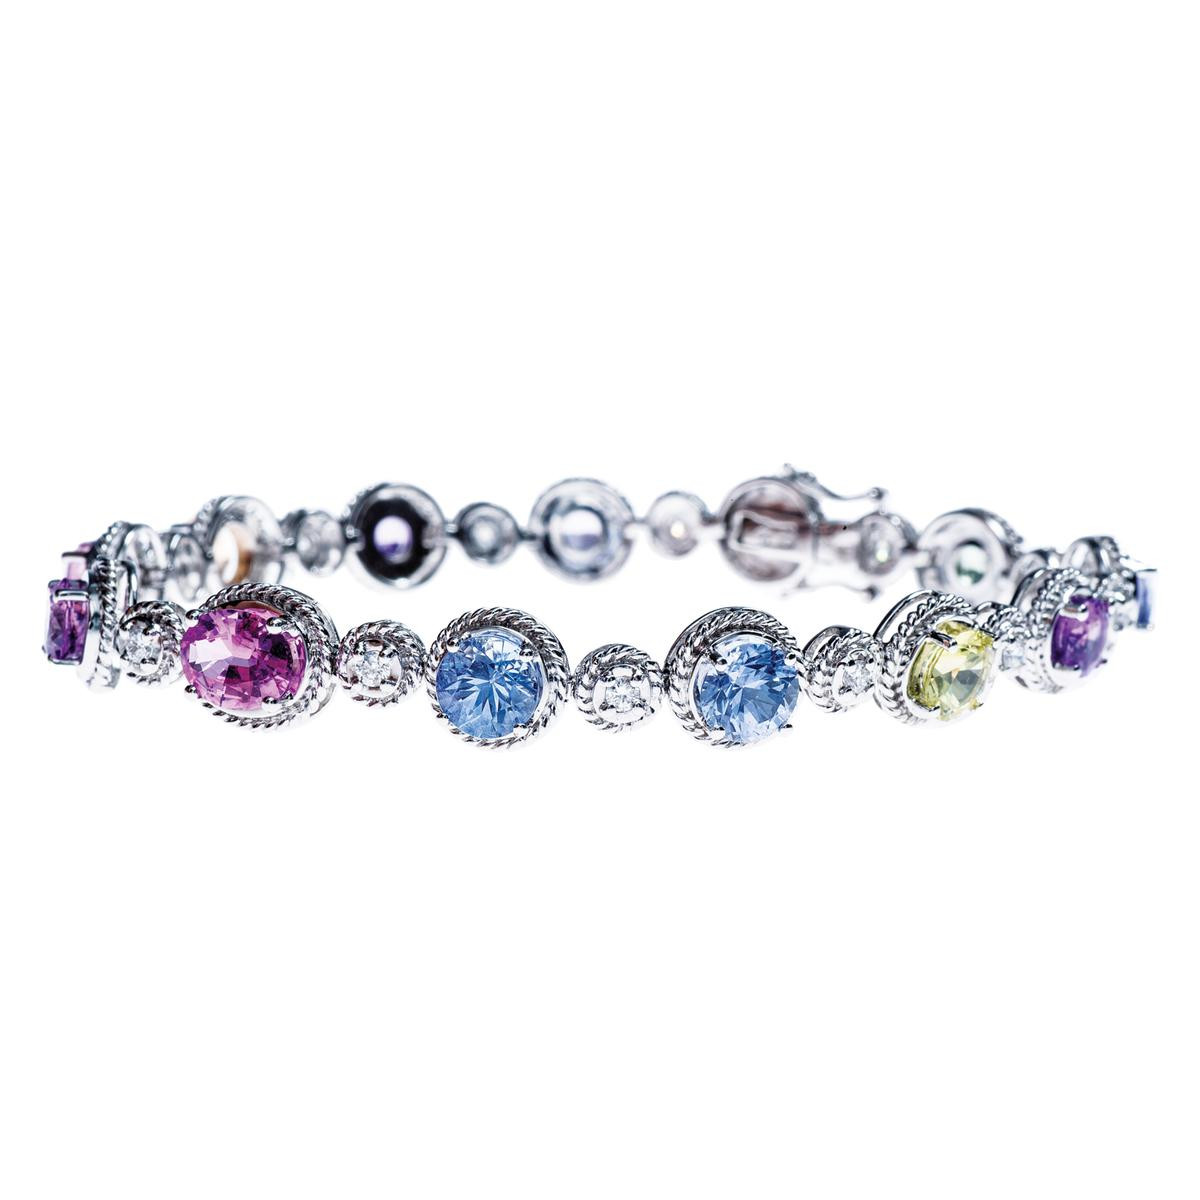 Vintage Judy Mayfield Multi-Colored Sapphire and Diamond Bracelet